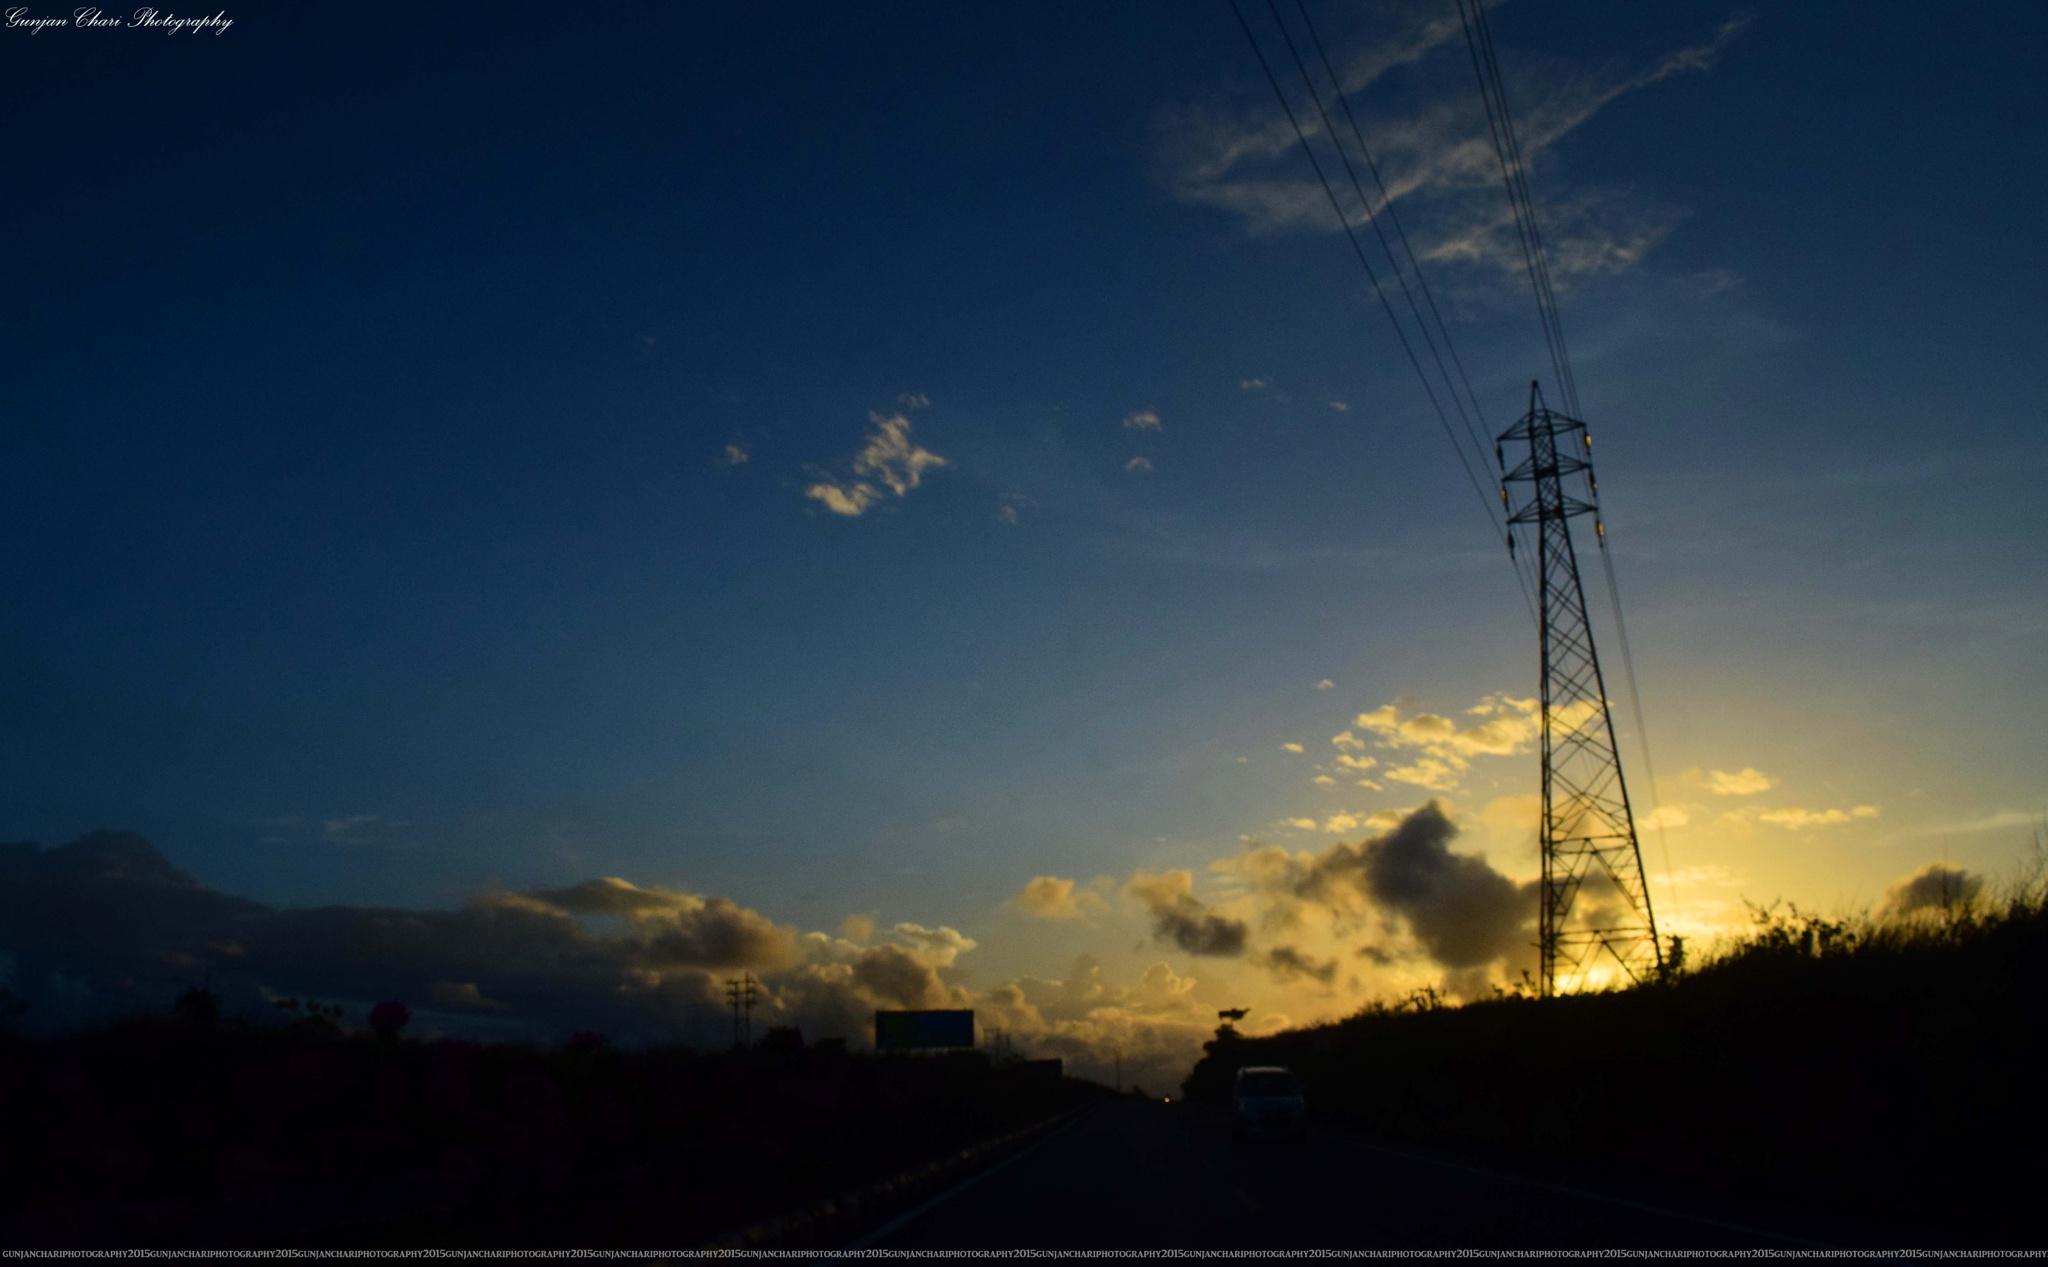 Dawn by Gunjan Chari